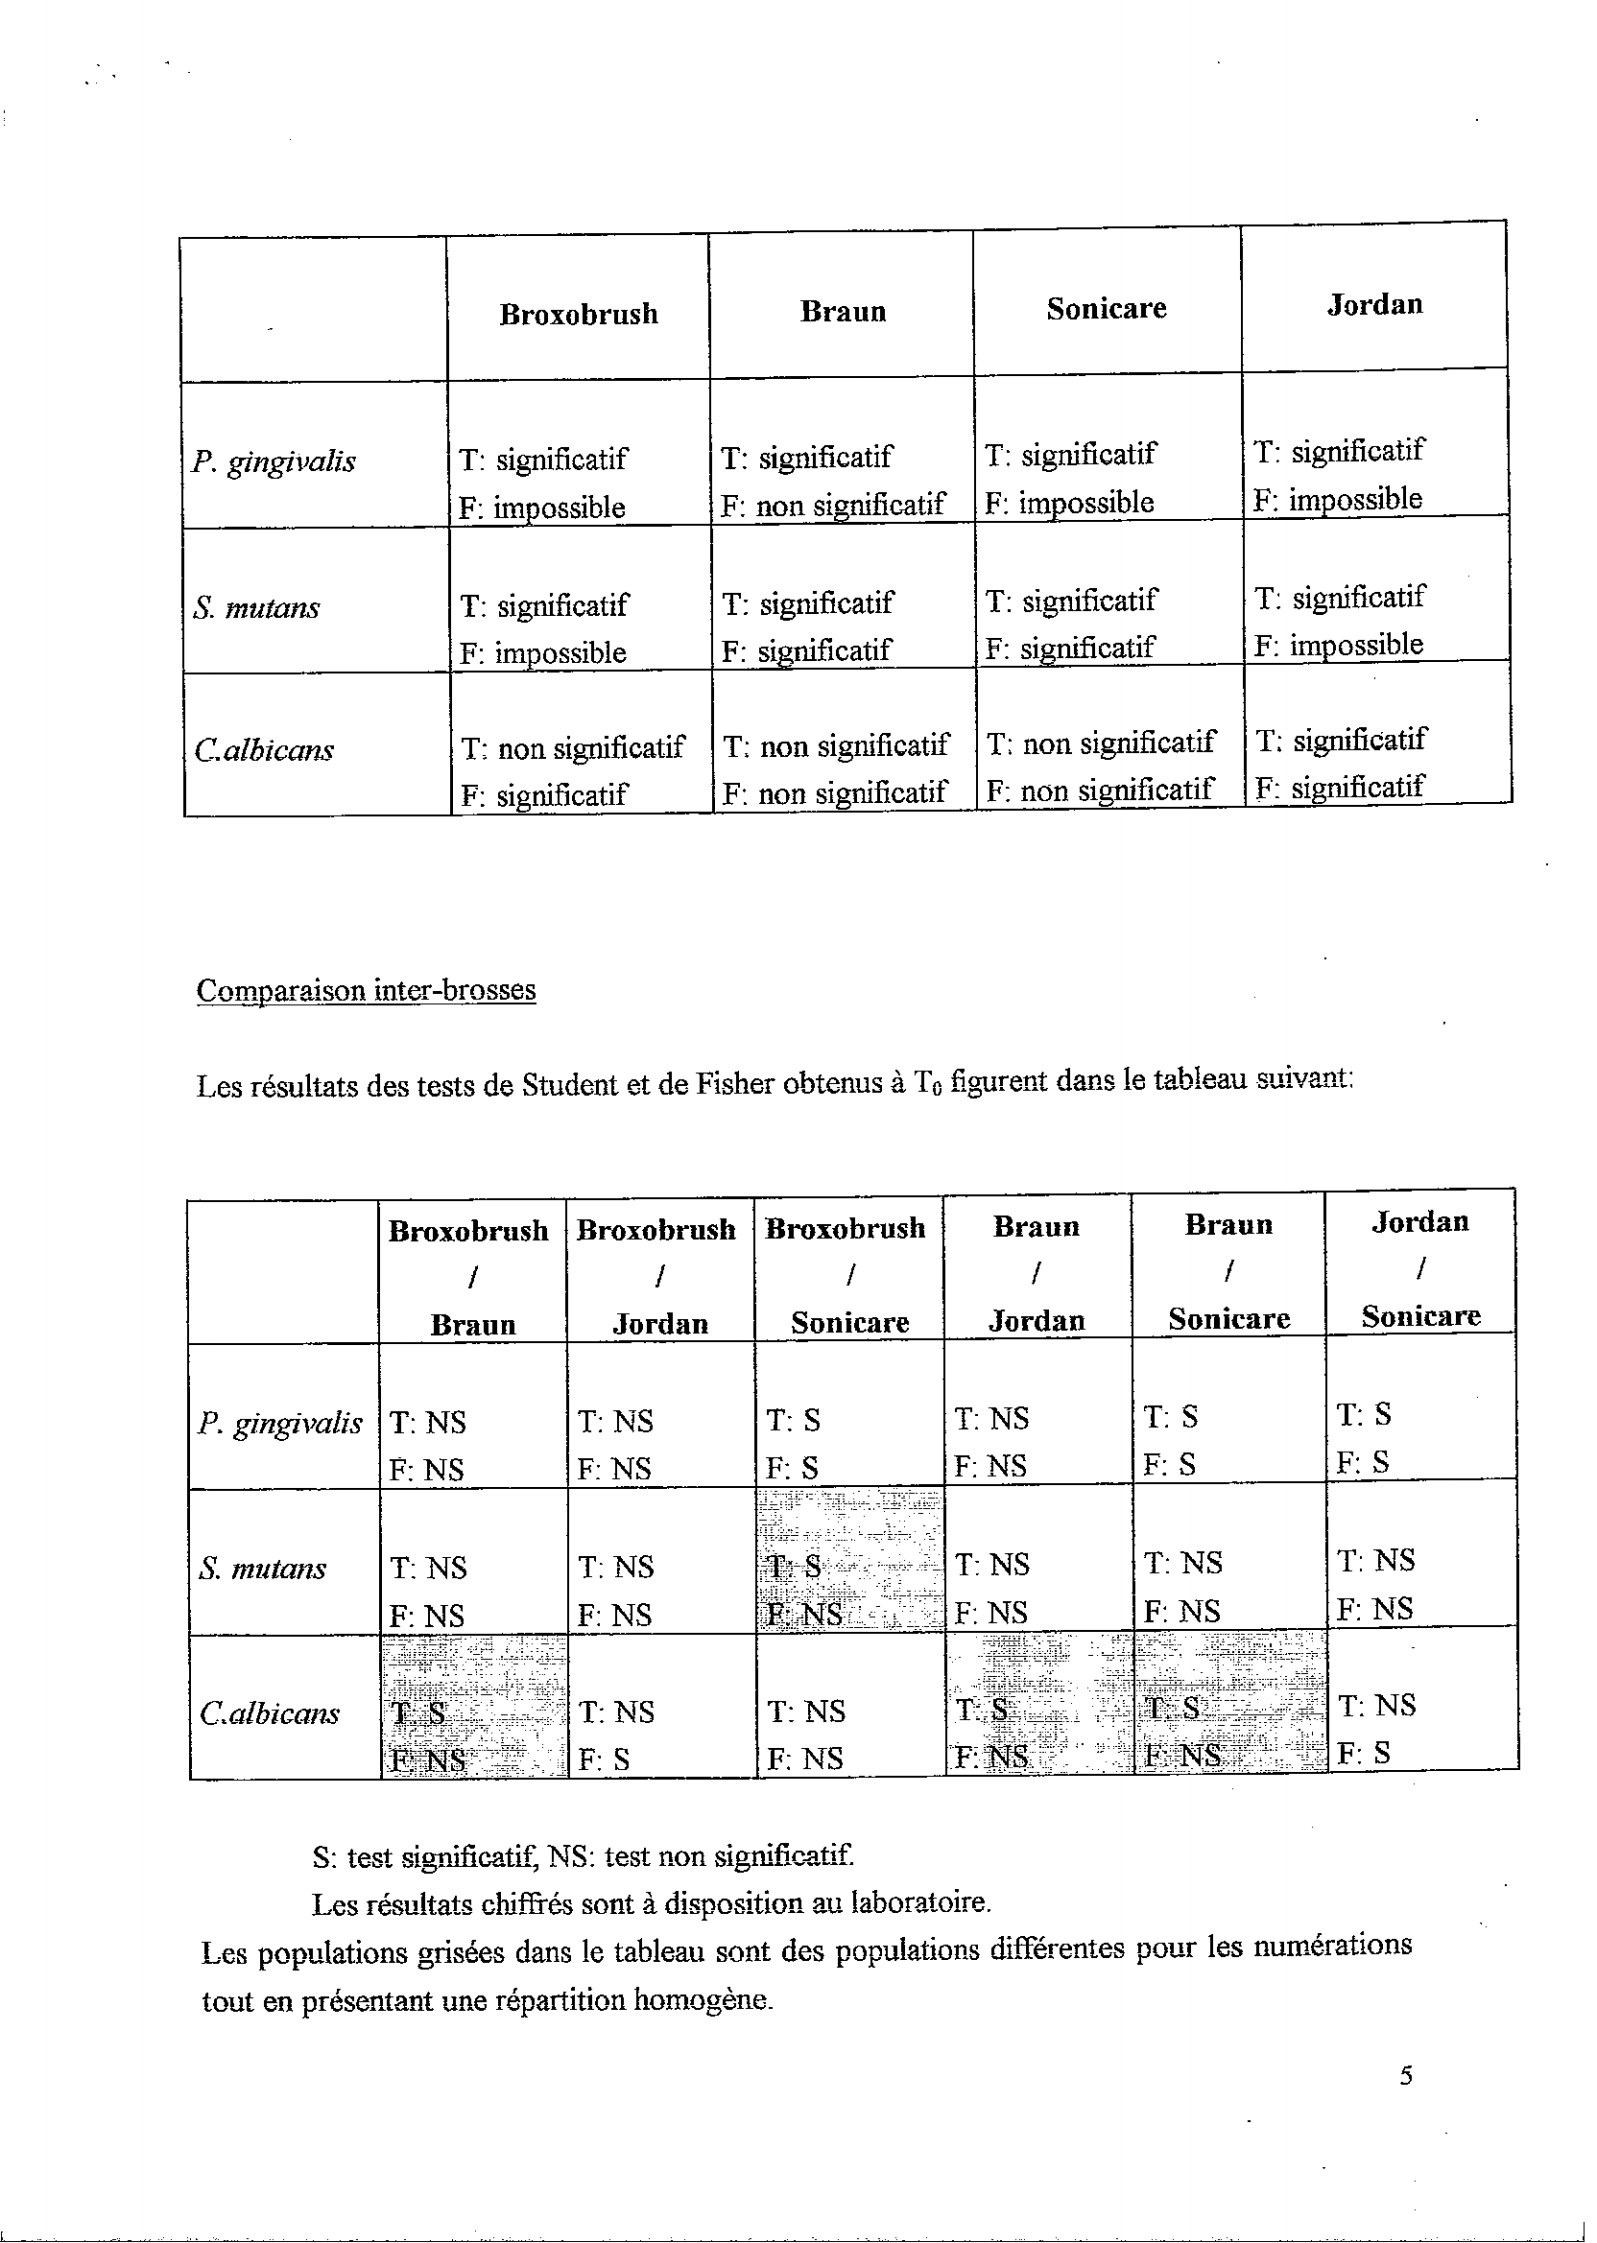 Etude6-page6